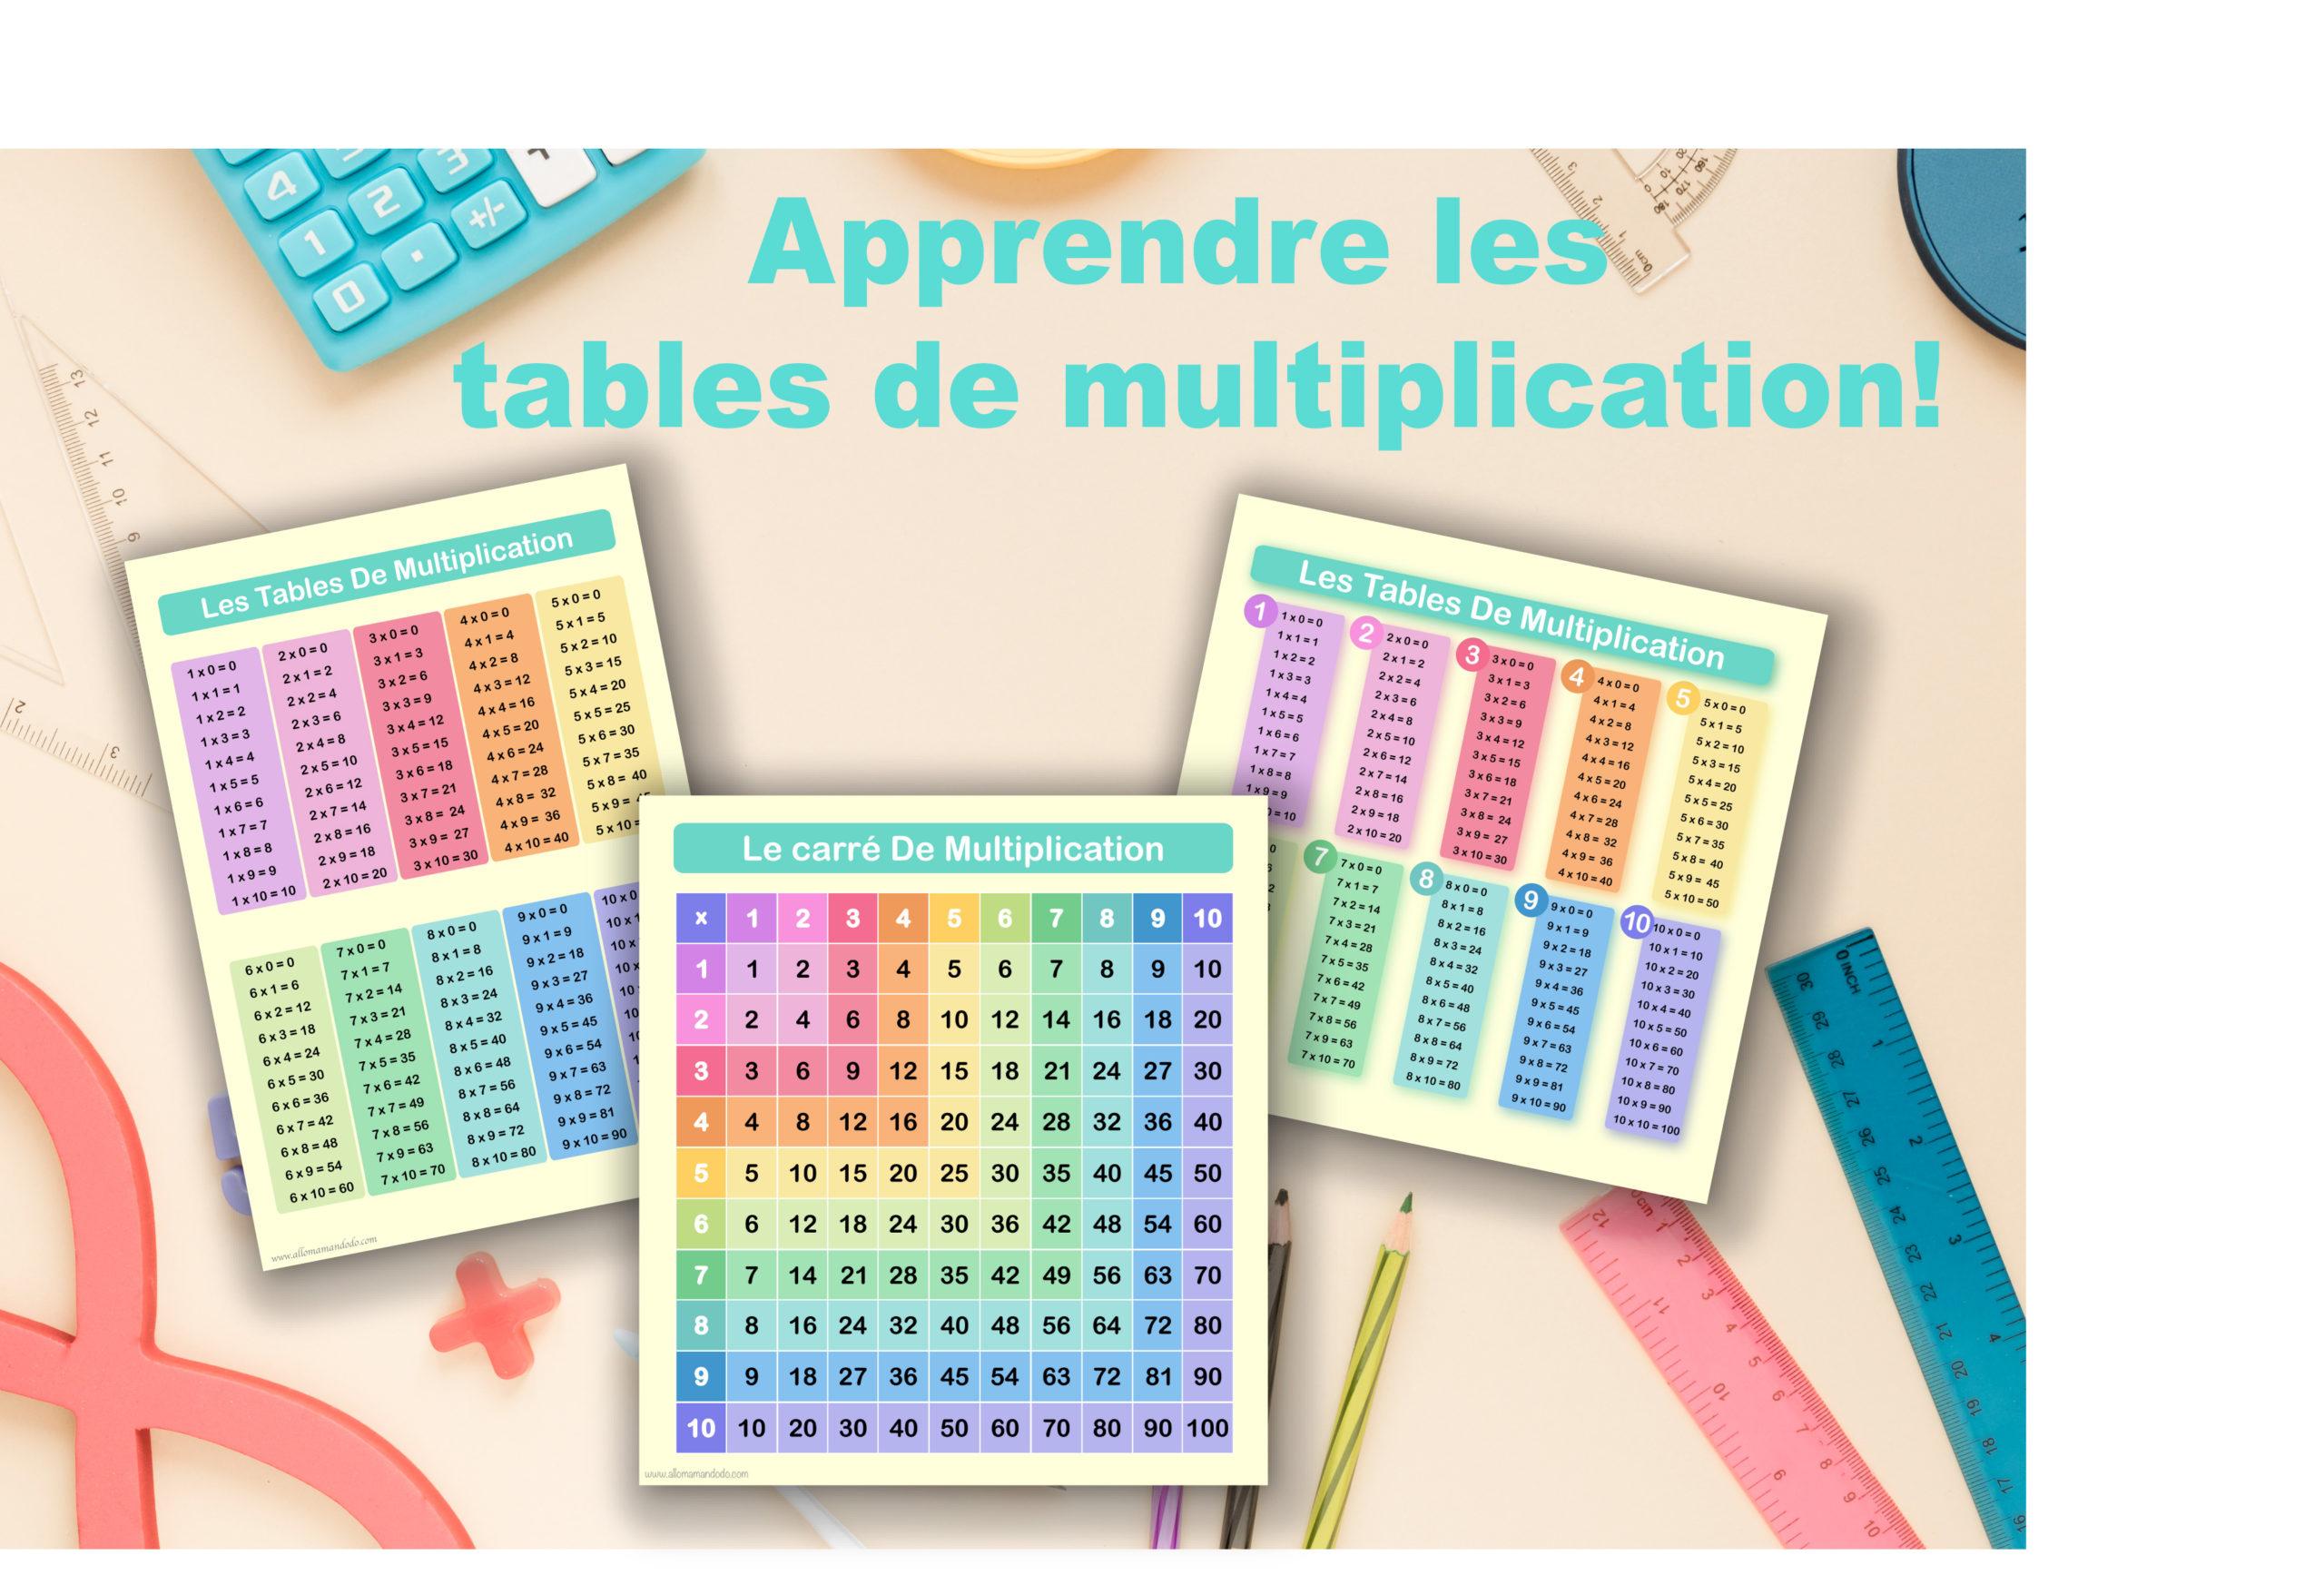 Apprendre les tables de multiplication! (Printables) - Allo Maman Dodo